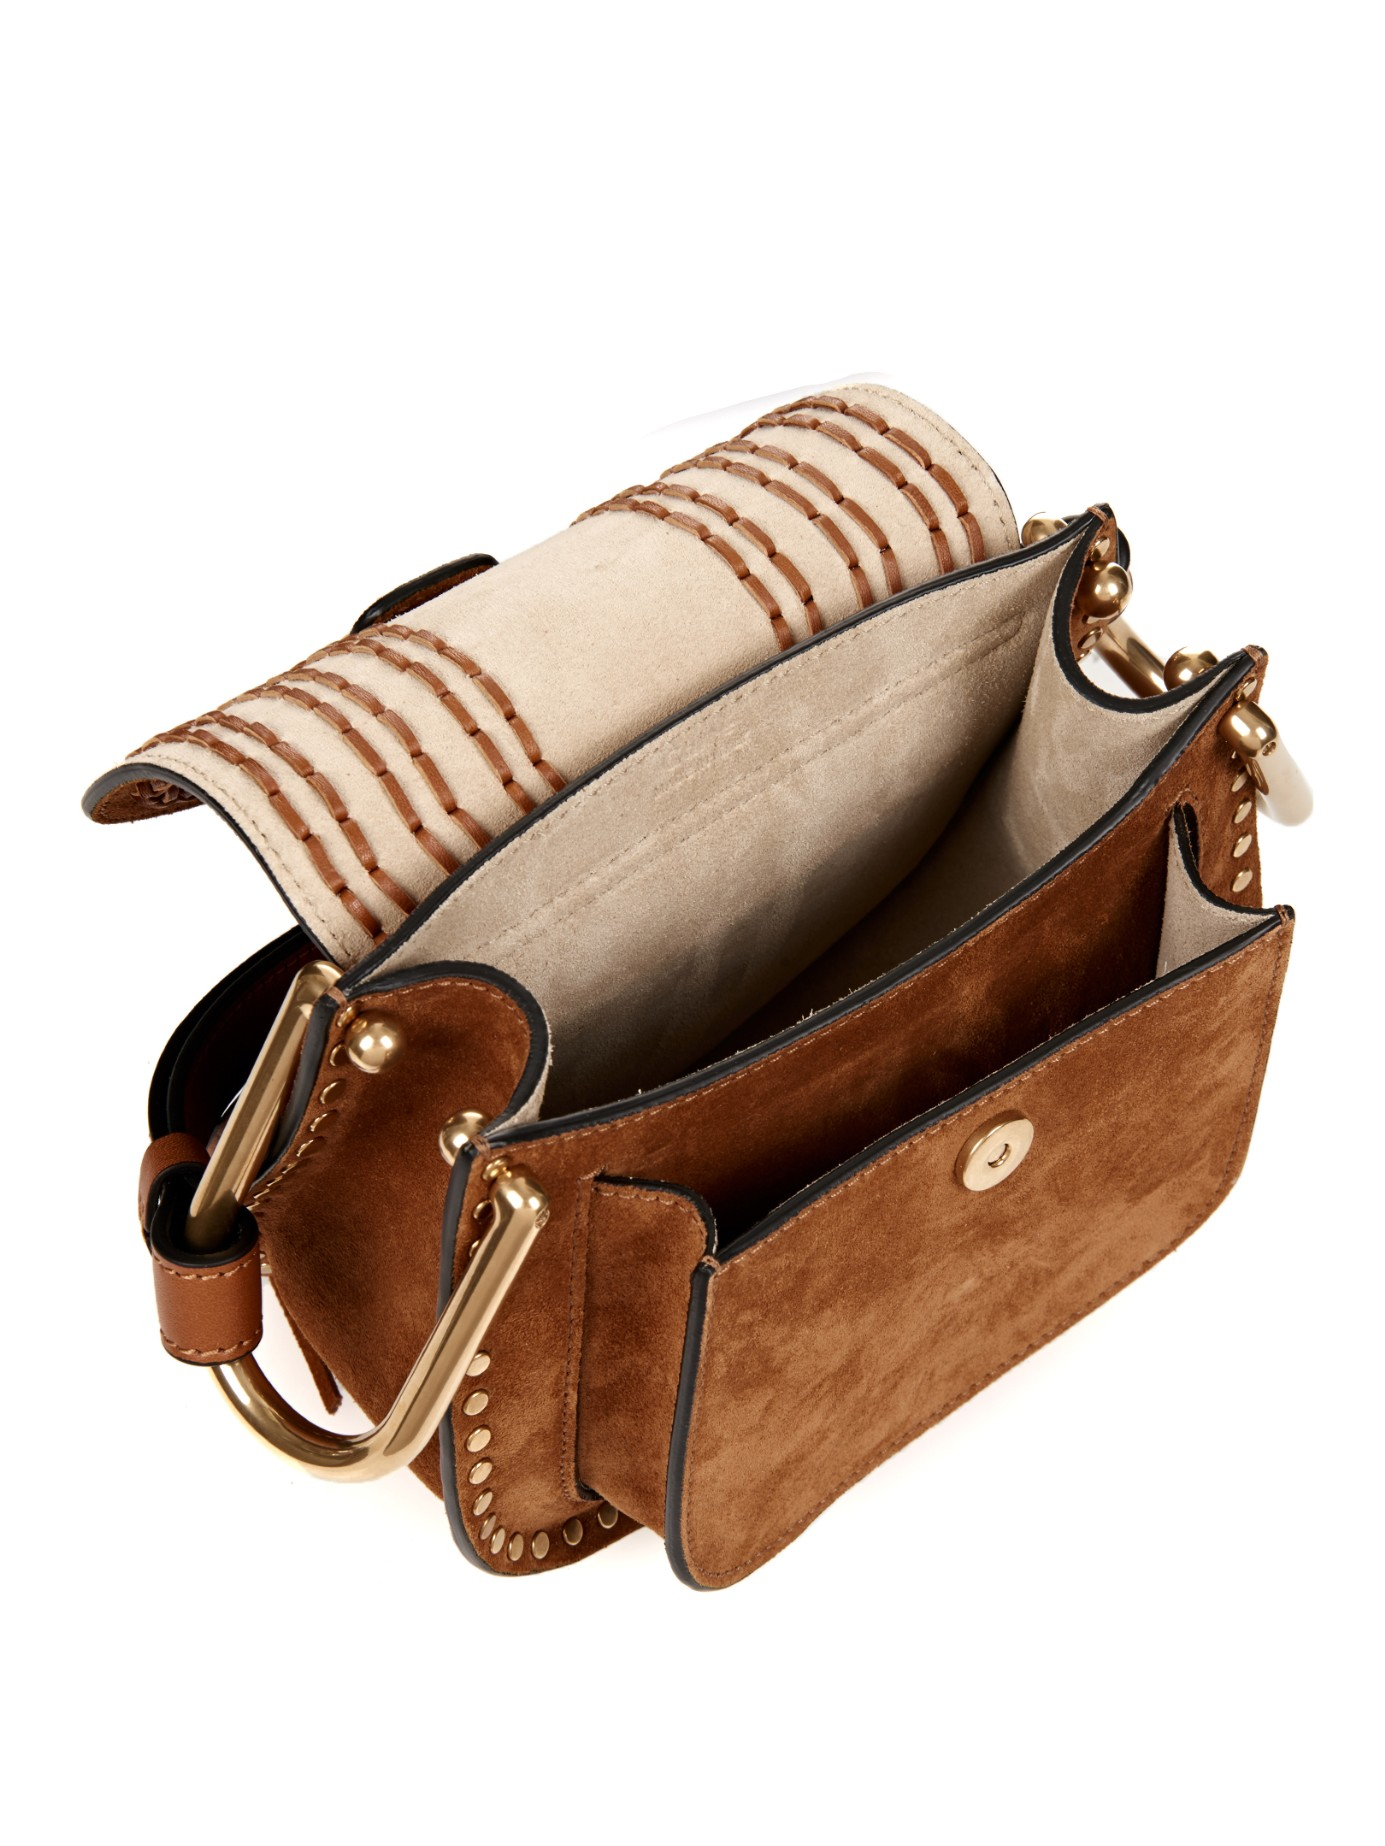 Le célèbre Lyst - Chloé Hudson Small Suede Cross-Body Bag in Brown &TZ_65